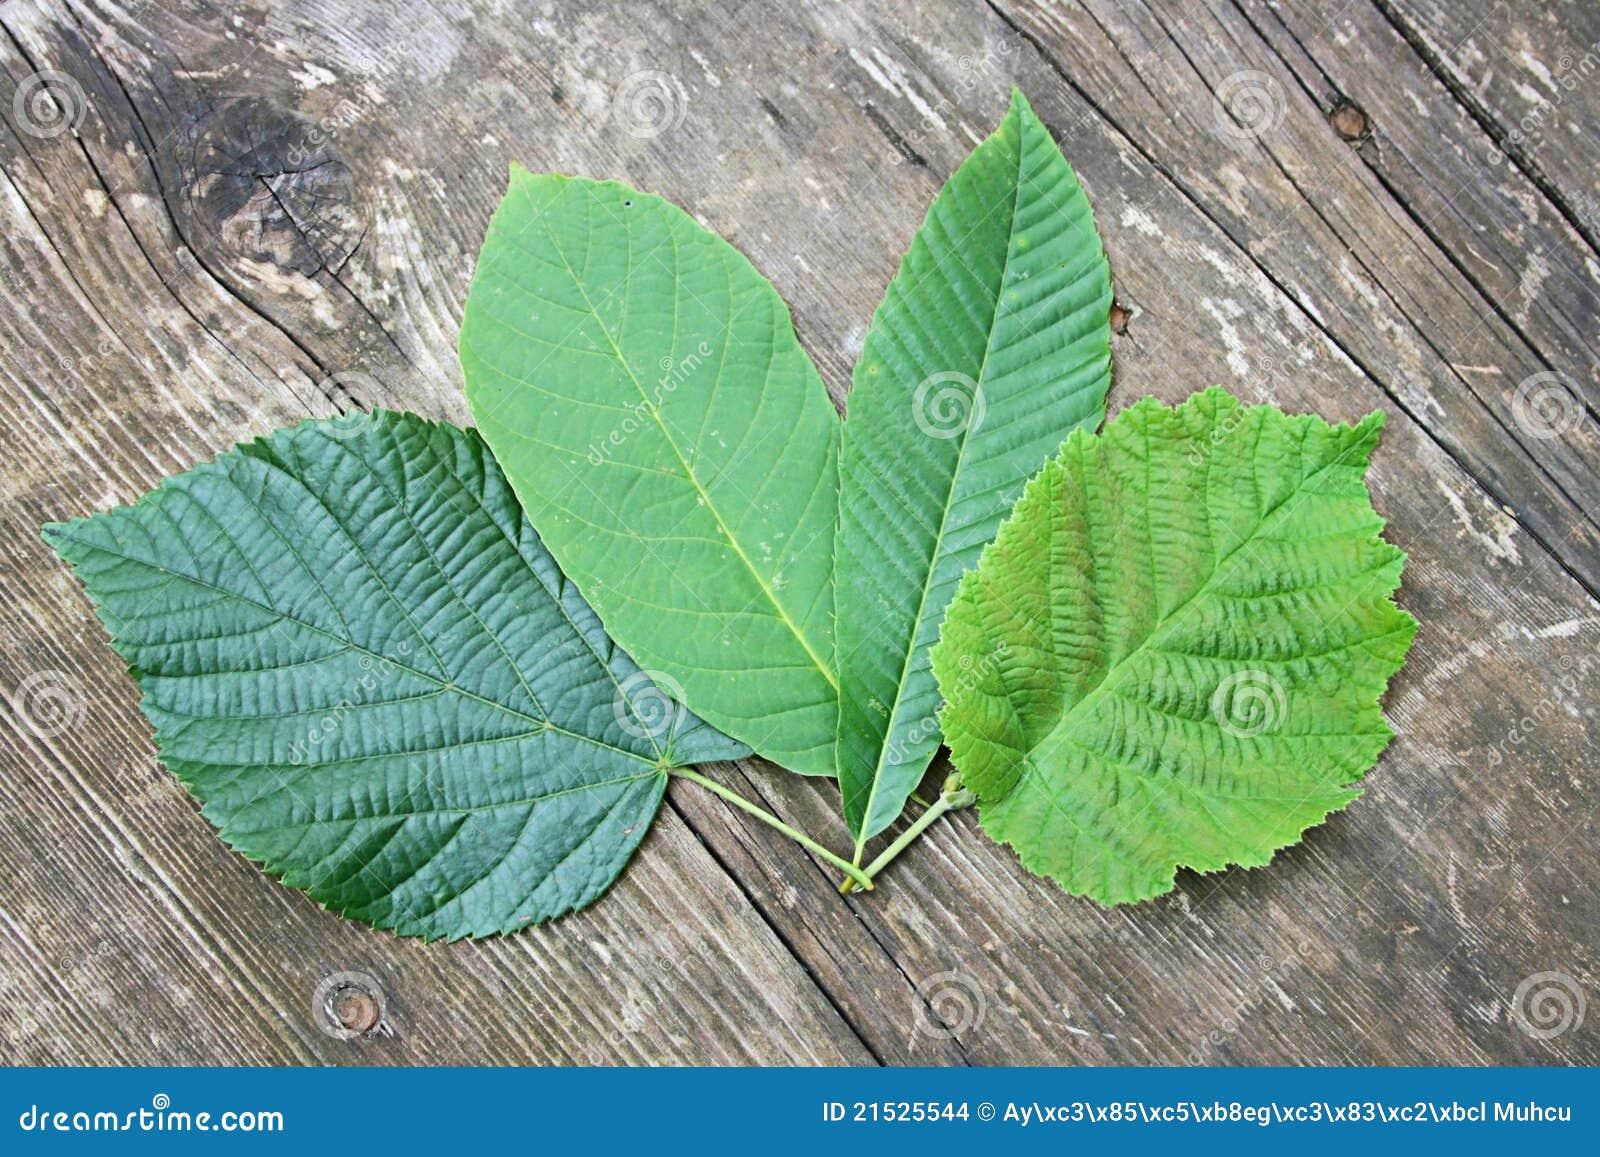 Hazelnut,Chestnut,Walnut And Linden Tree Leaves Stock ...